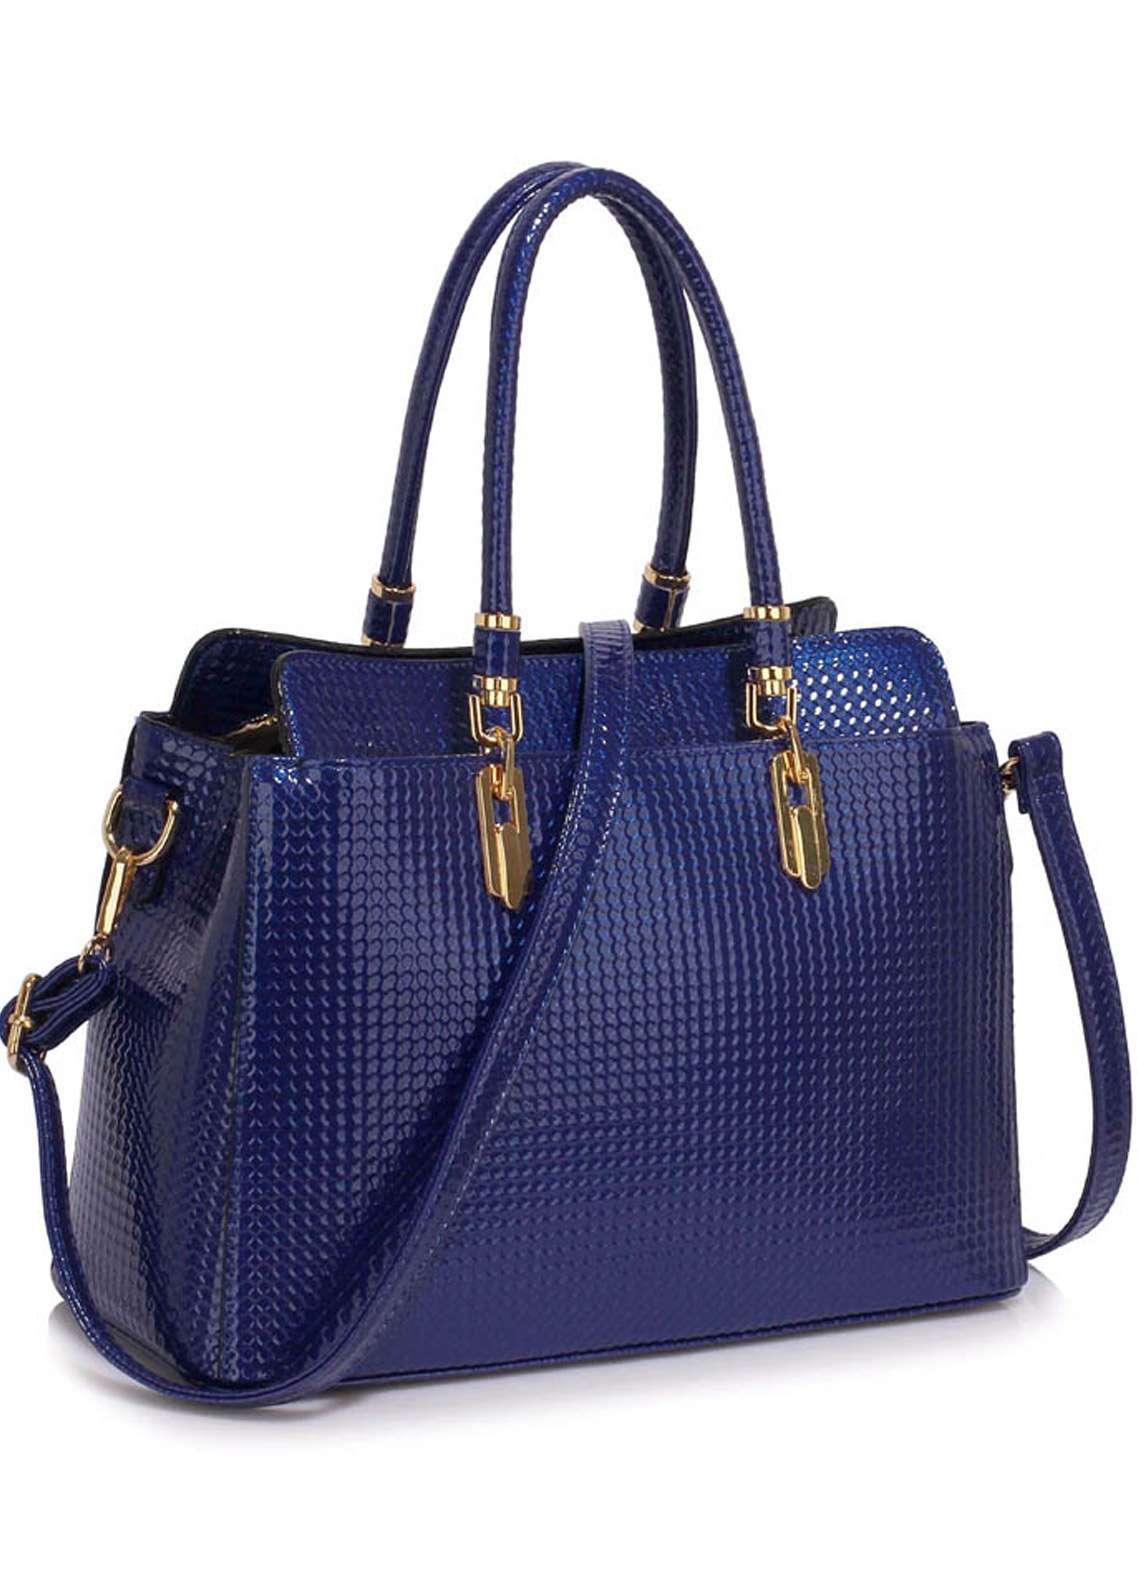 Leesun London Faux Leather Satchels Bags for Women Navy